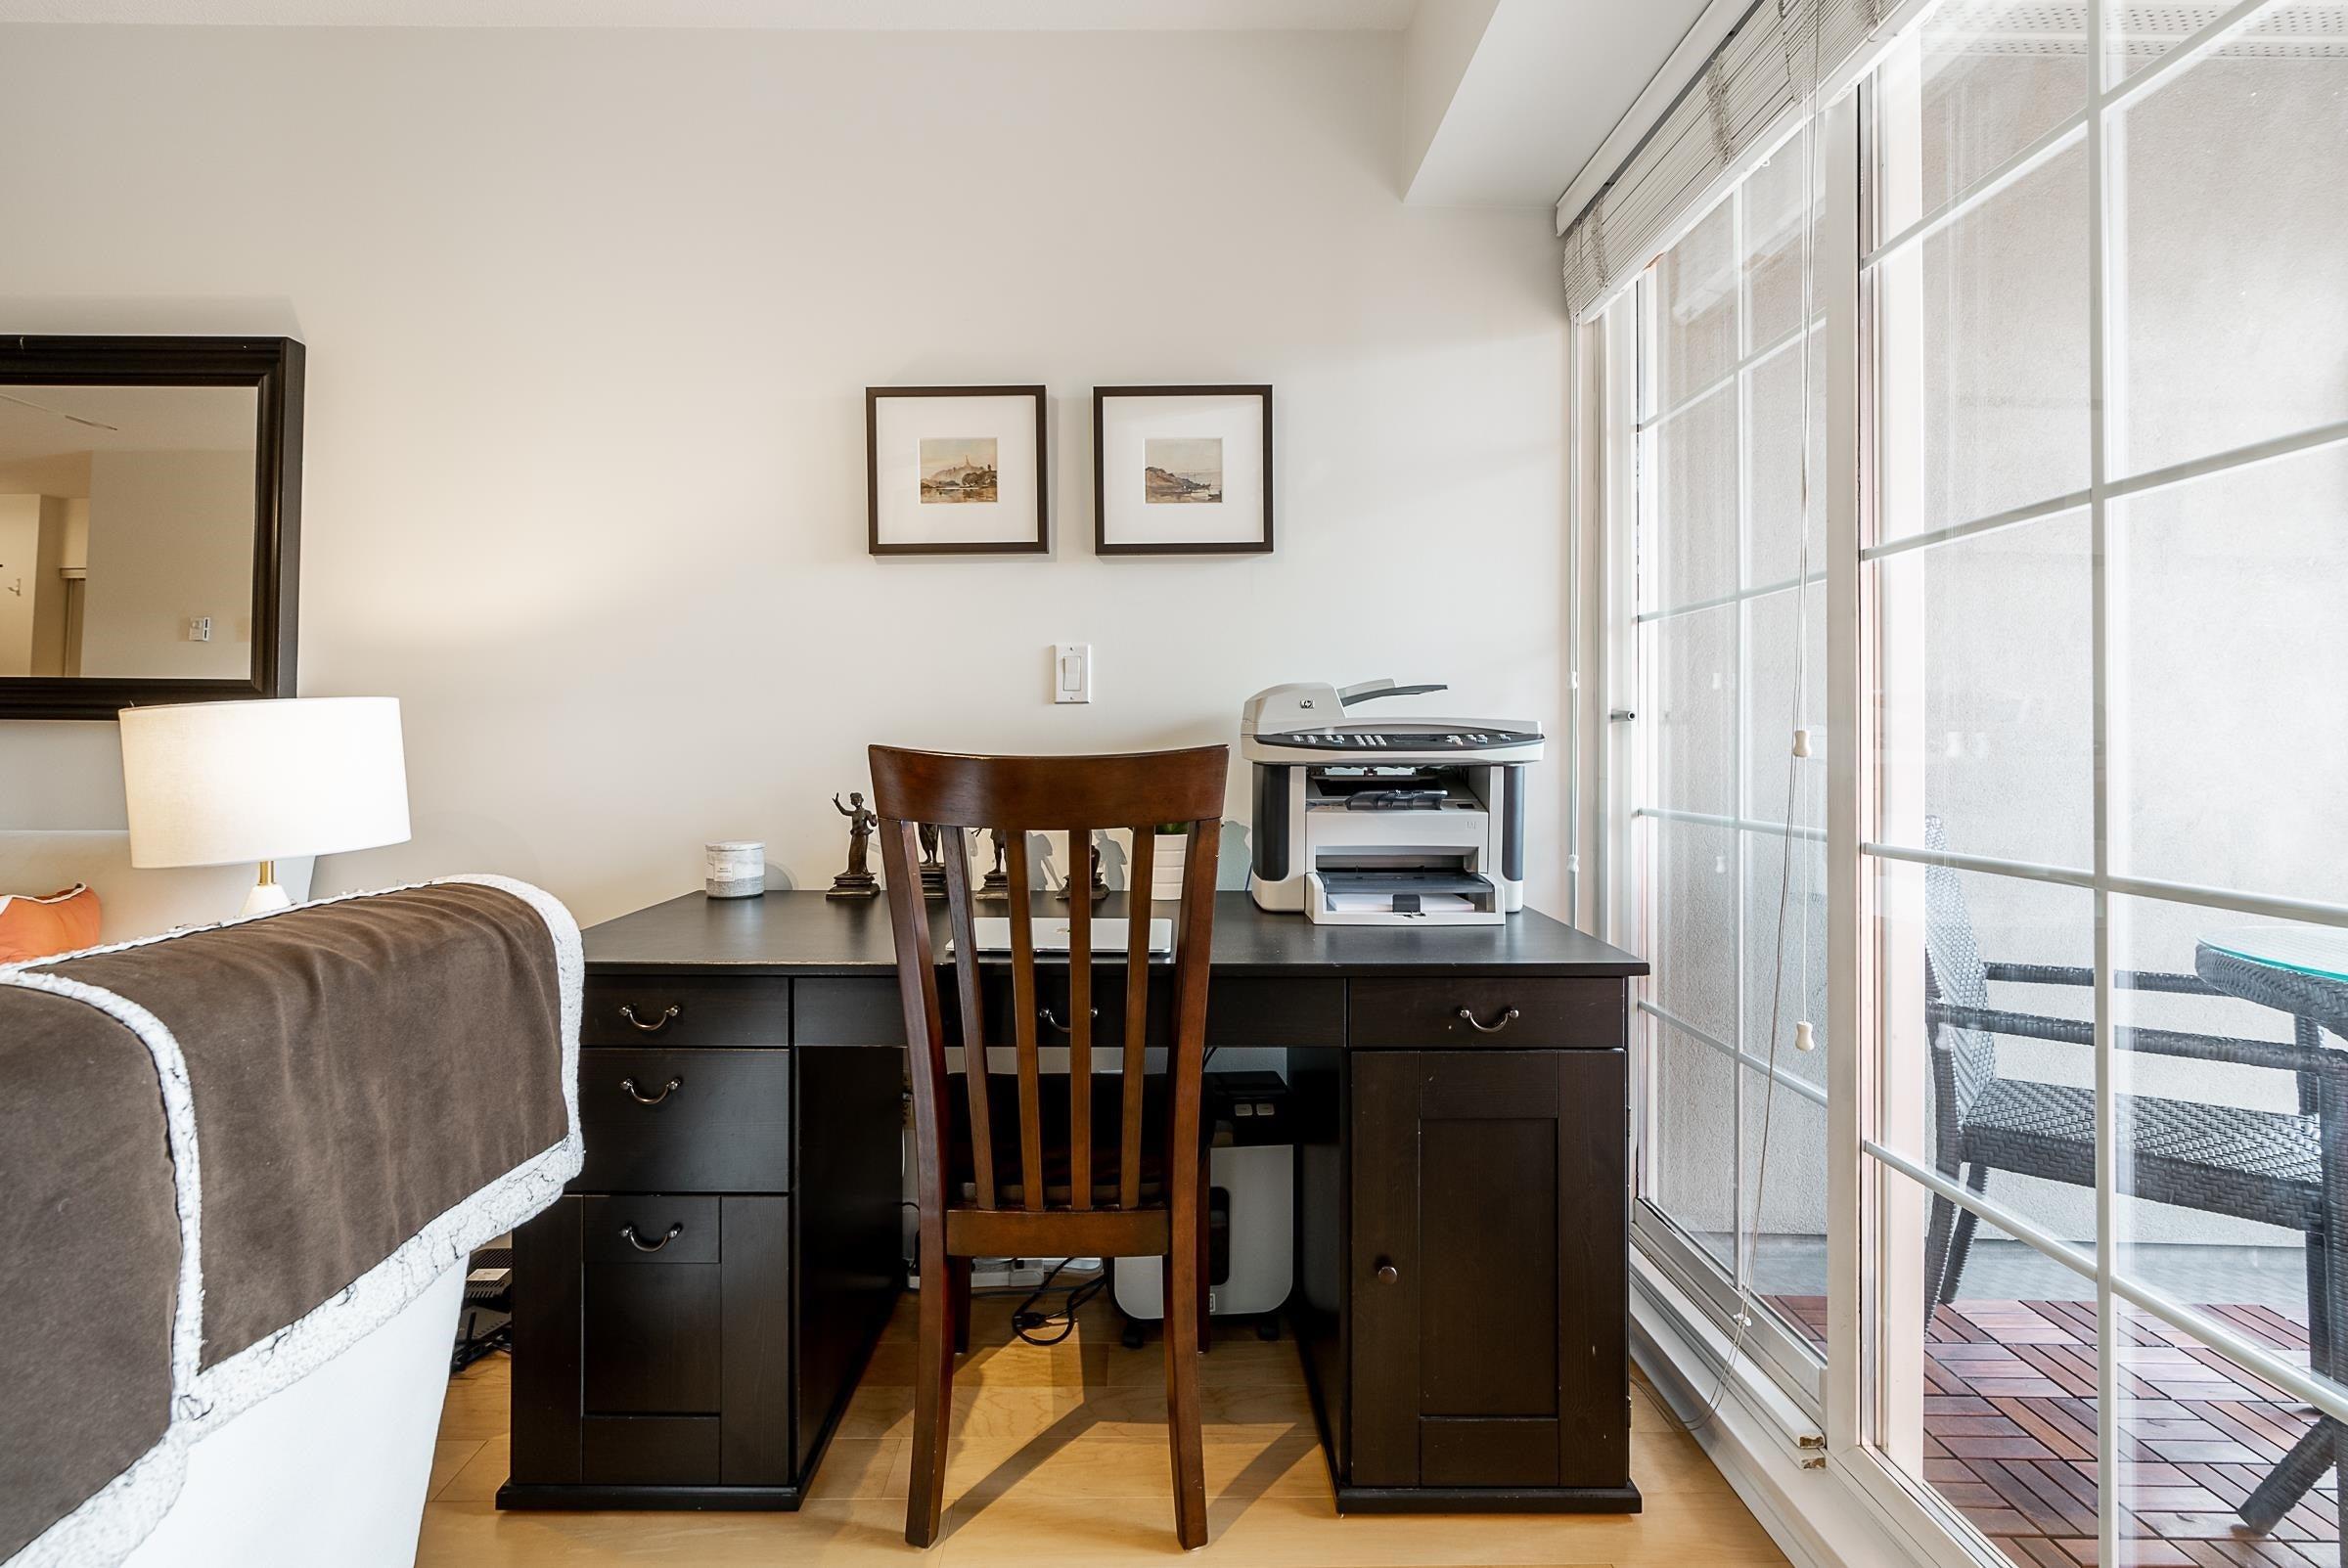 406 1989 DUNBAR STREET - Kitsilano Apartment/Condo for sale, 1 Bedroom (R2624949) - #5